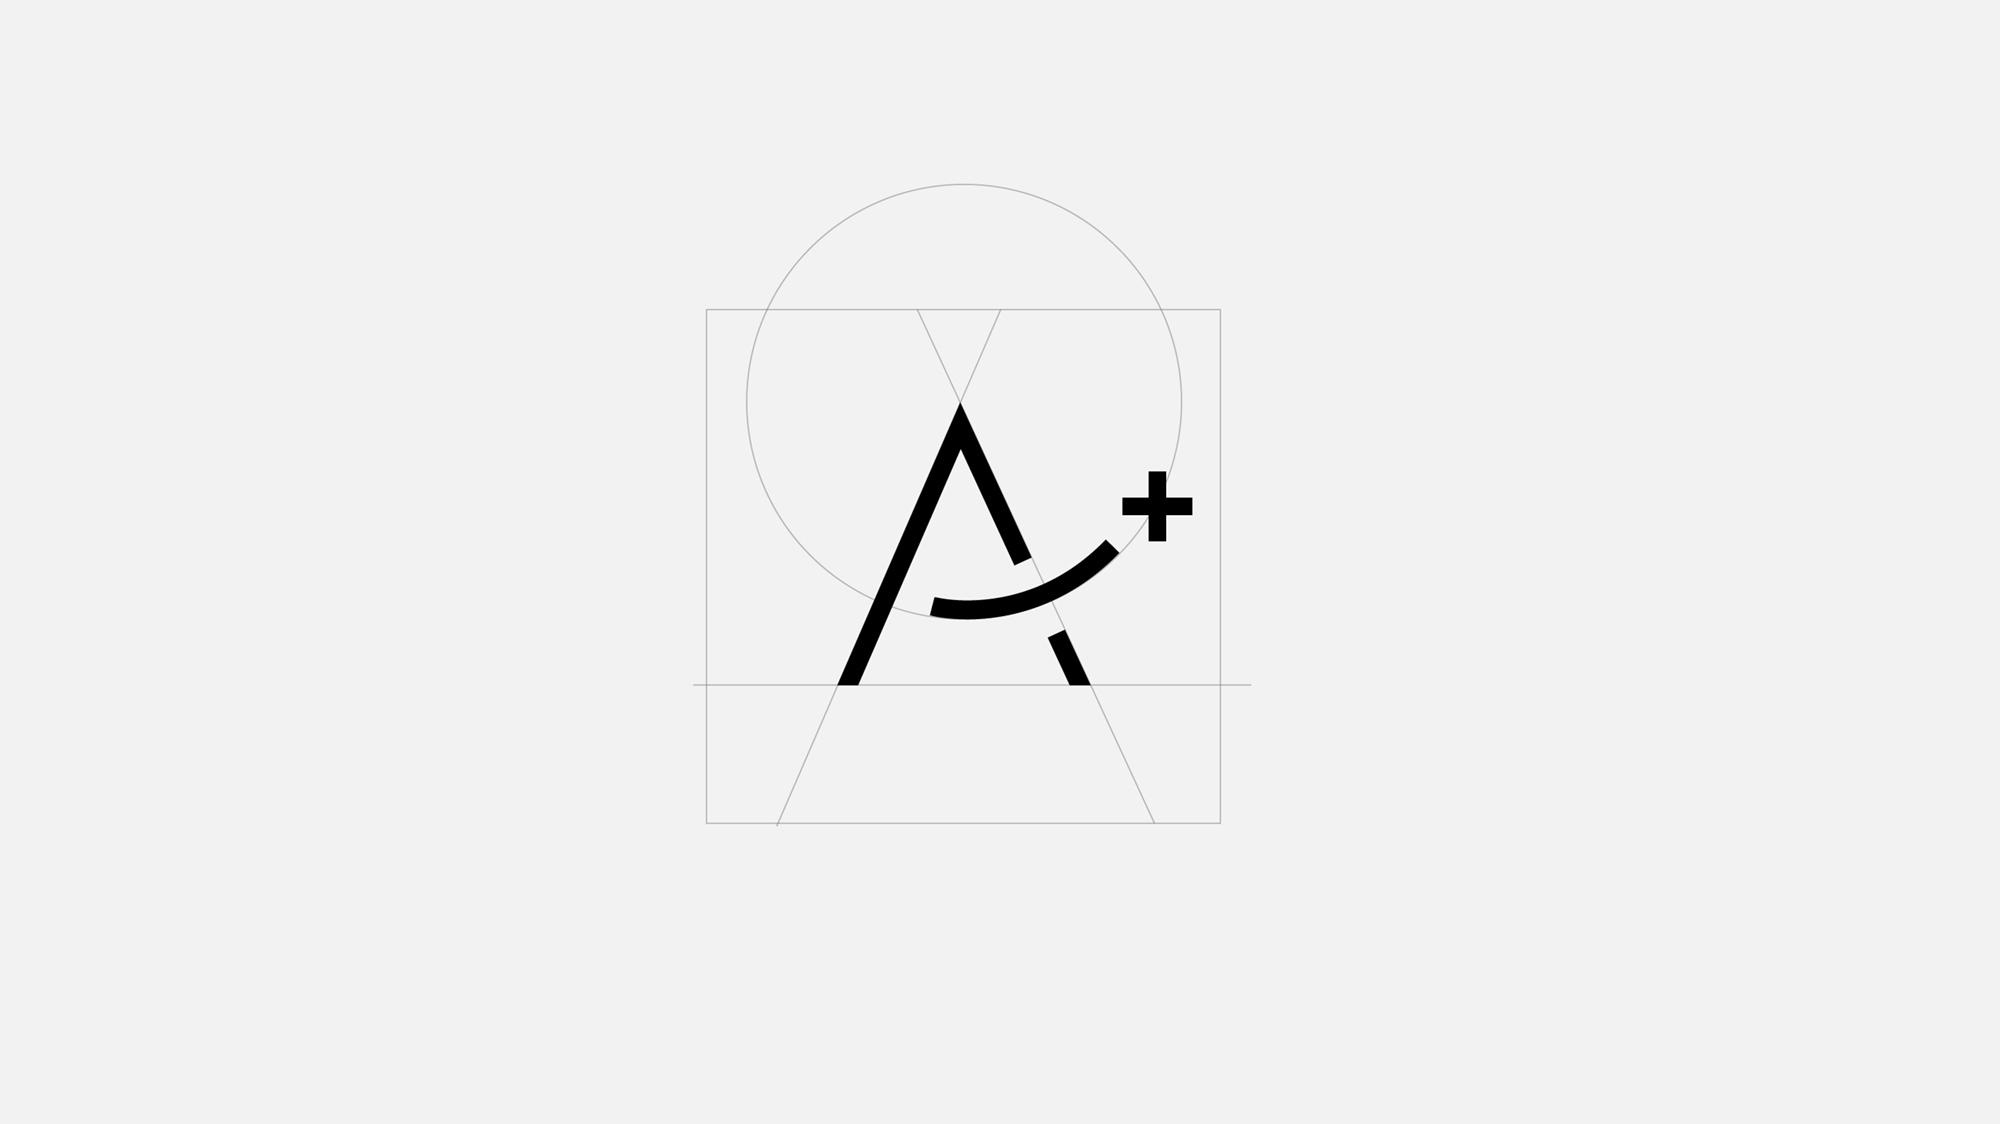 Accessability_Advantage_Explorations_R2